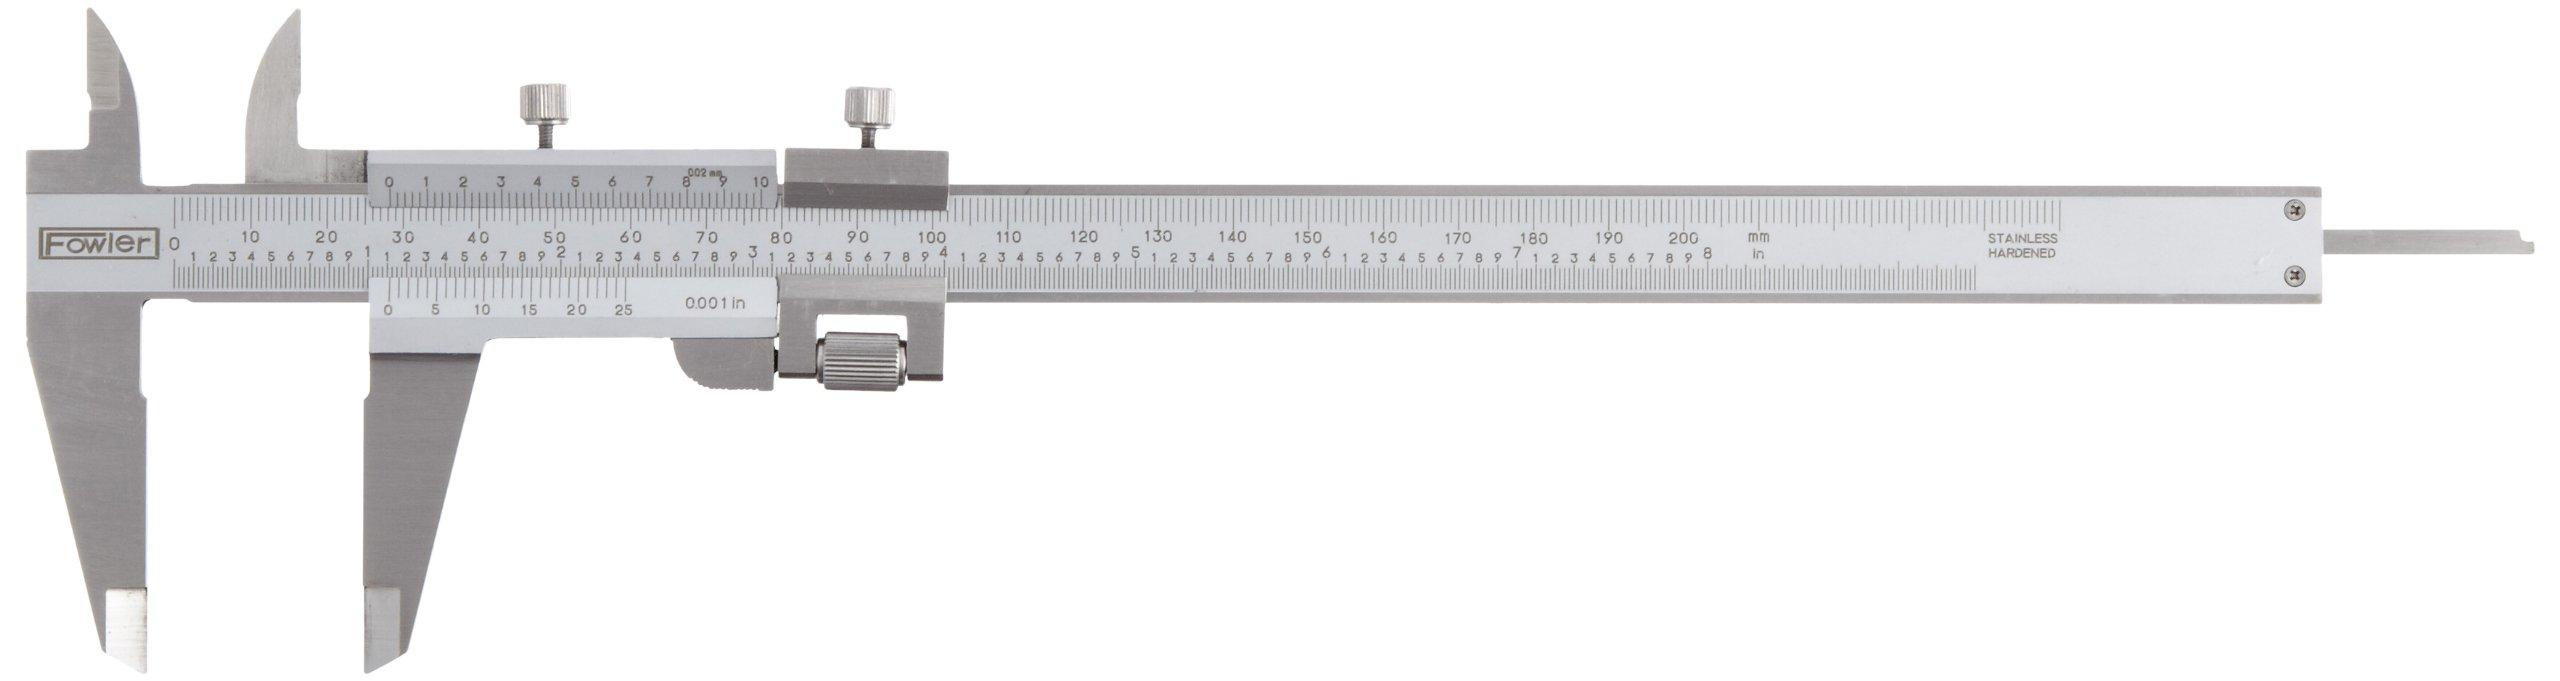 Fowler 52-058-008 Stainless Steel Fine Adjustment Vernier Caliper with Satin Chrome Finish, 0-8''/0-200mm Measuring Range, 0.001''/0.02mm Graduation